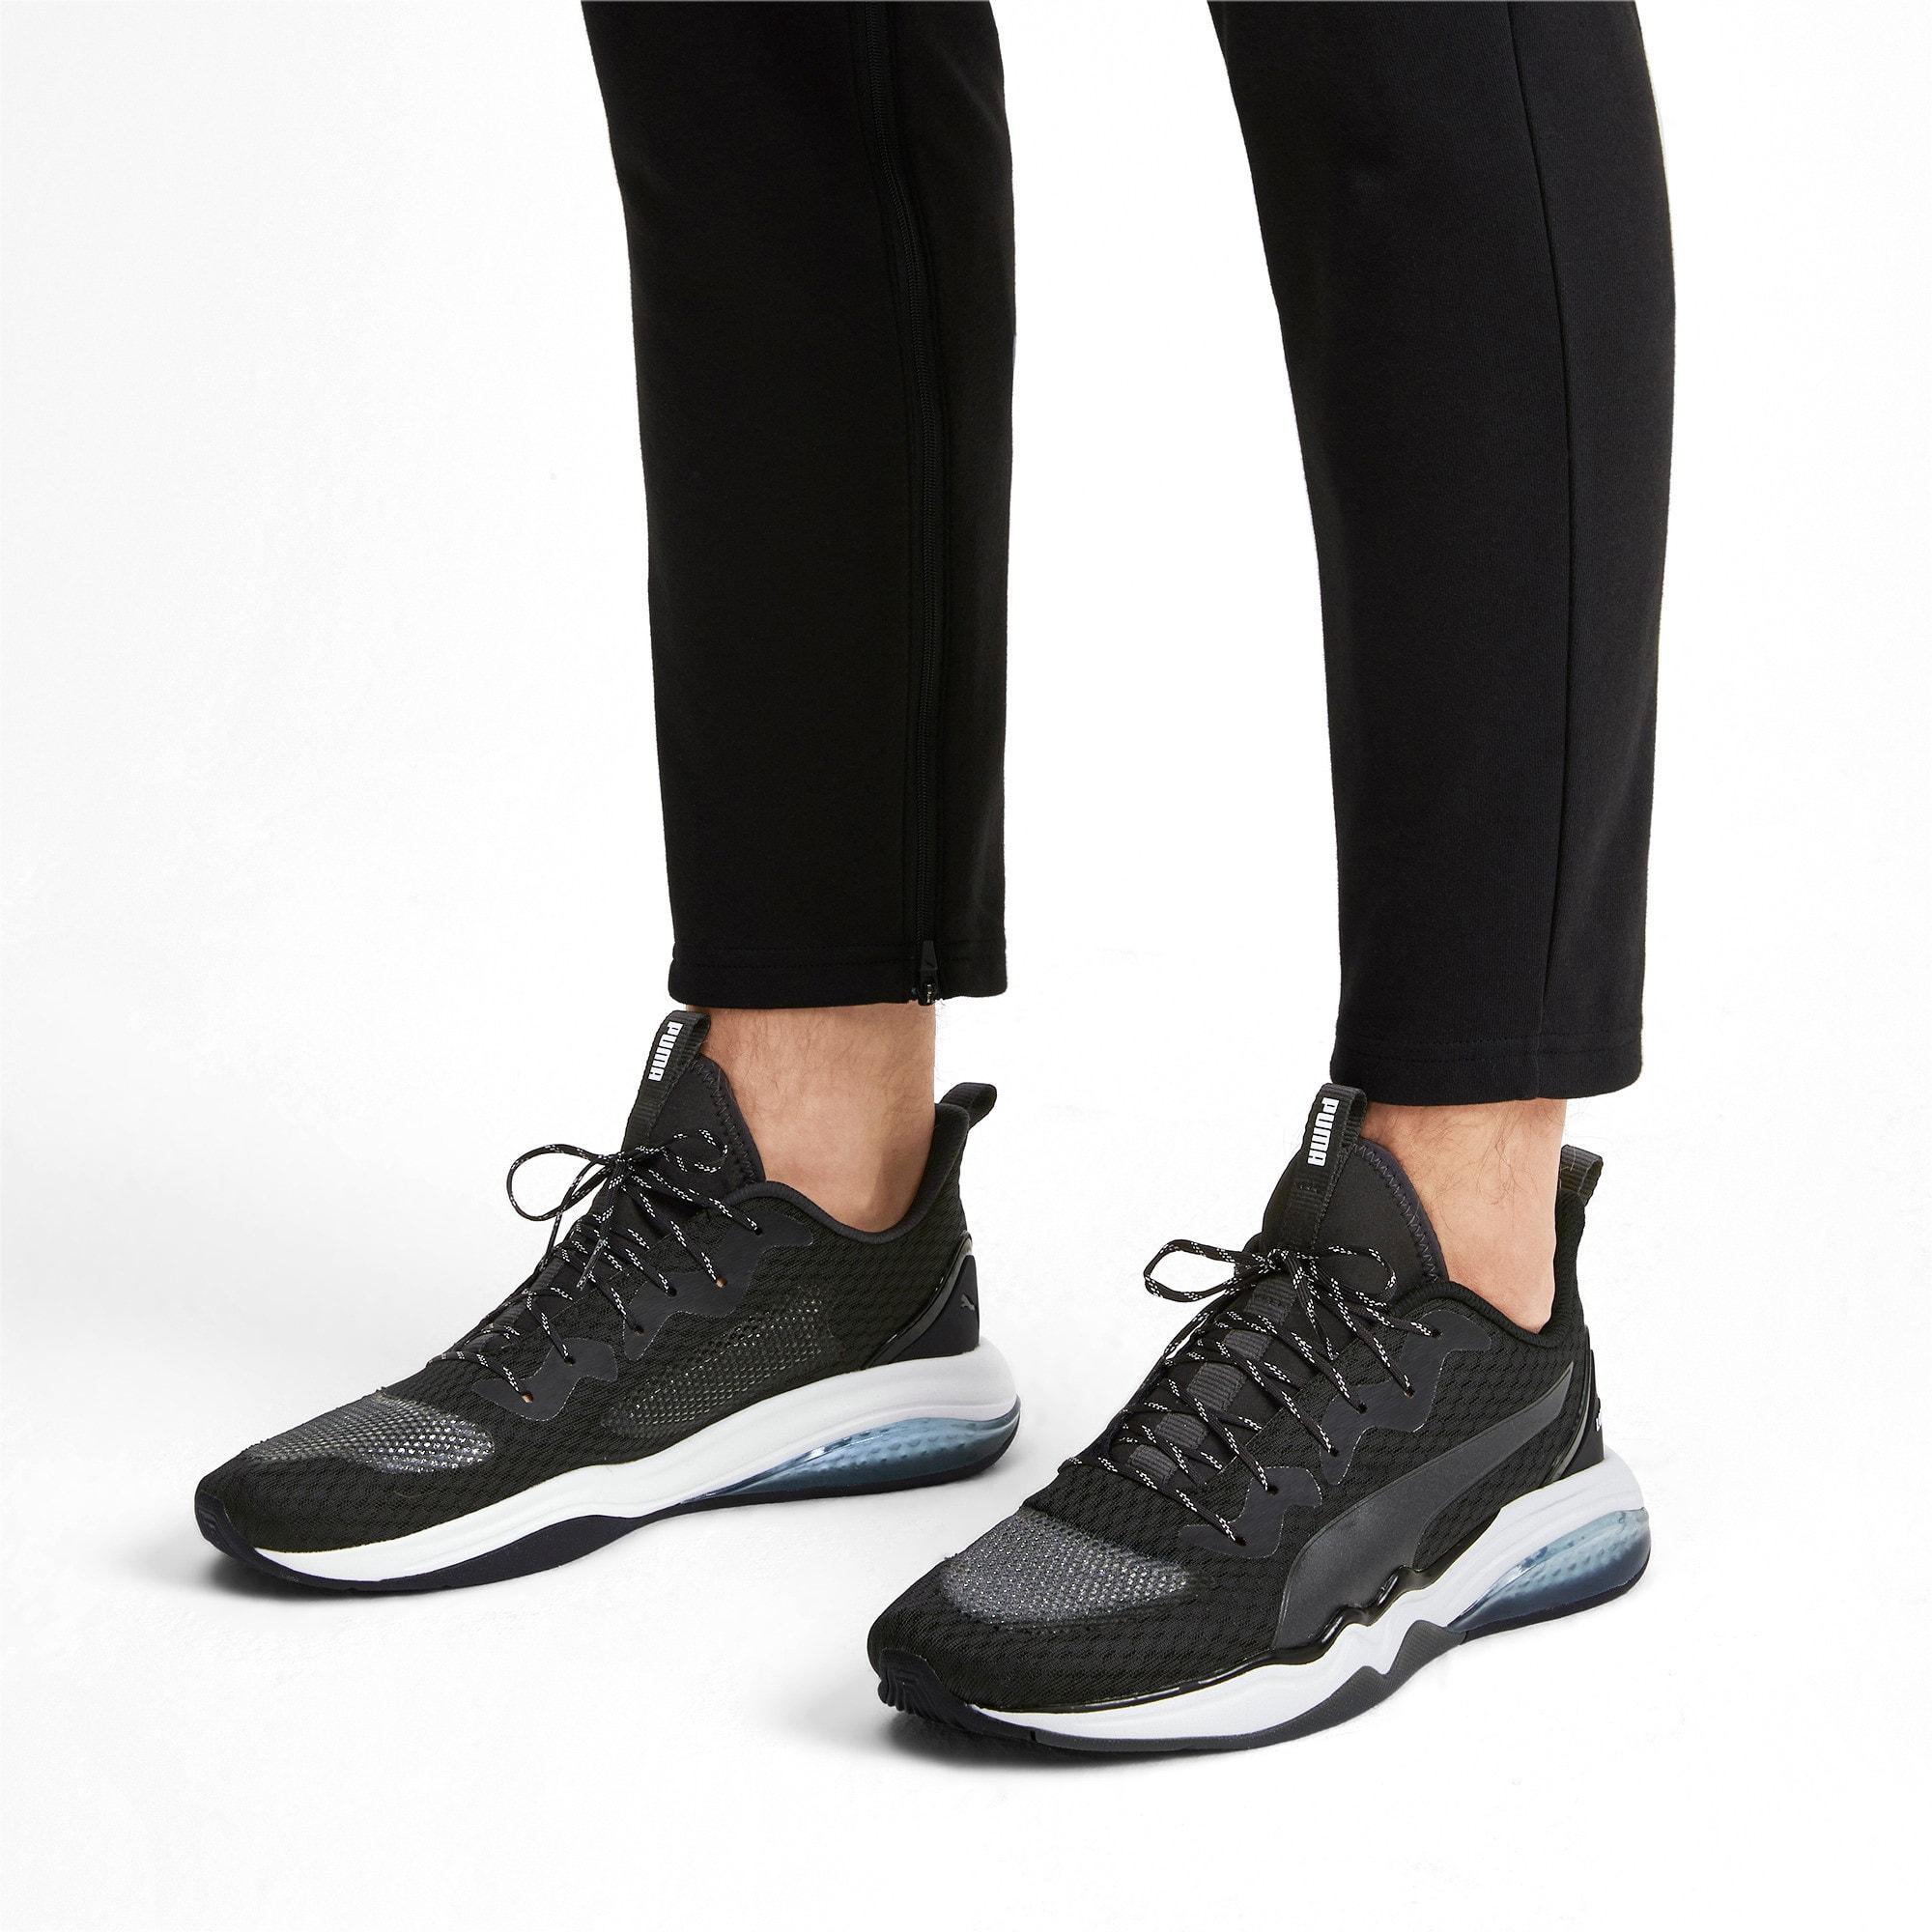 Thumbnail 2 of LQDCELL Tension Men's Training Shoes, Puma Black-Puma White, medium-IND